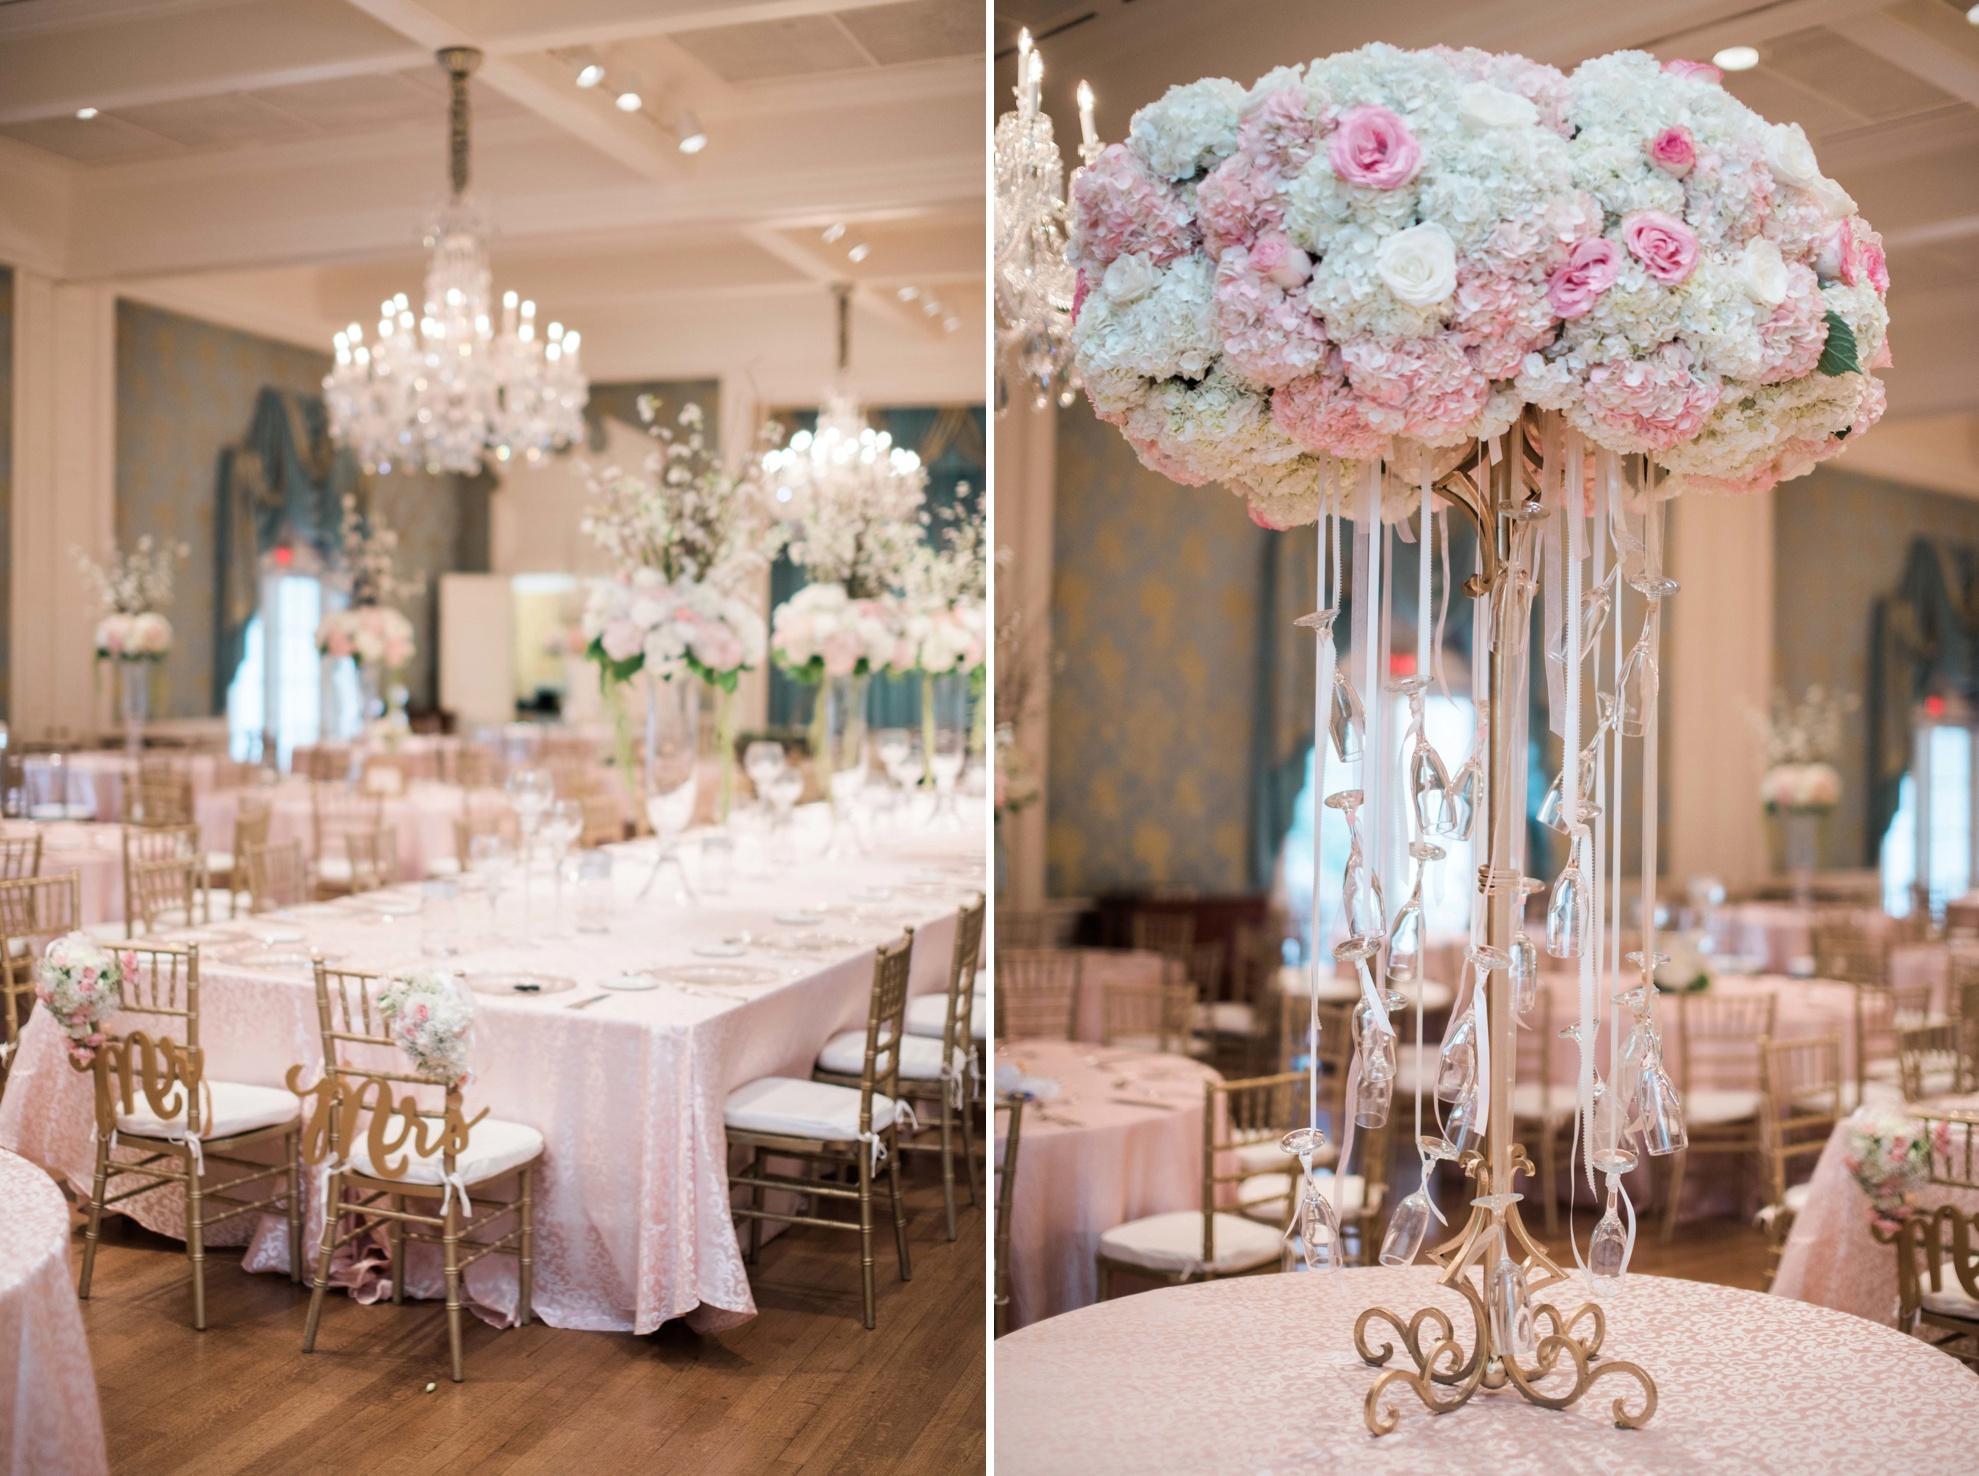 The-Junior-League-Houston-Chapter-Wedding-Reception-Dana-Fernandez-Photography-Film-Venue-1.jpg